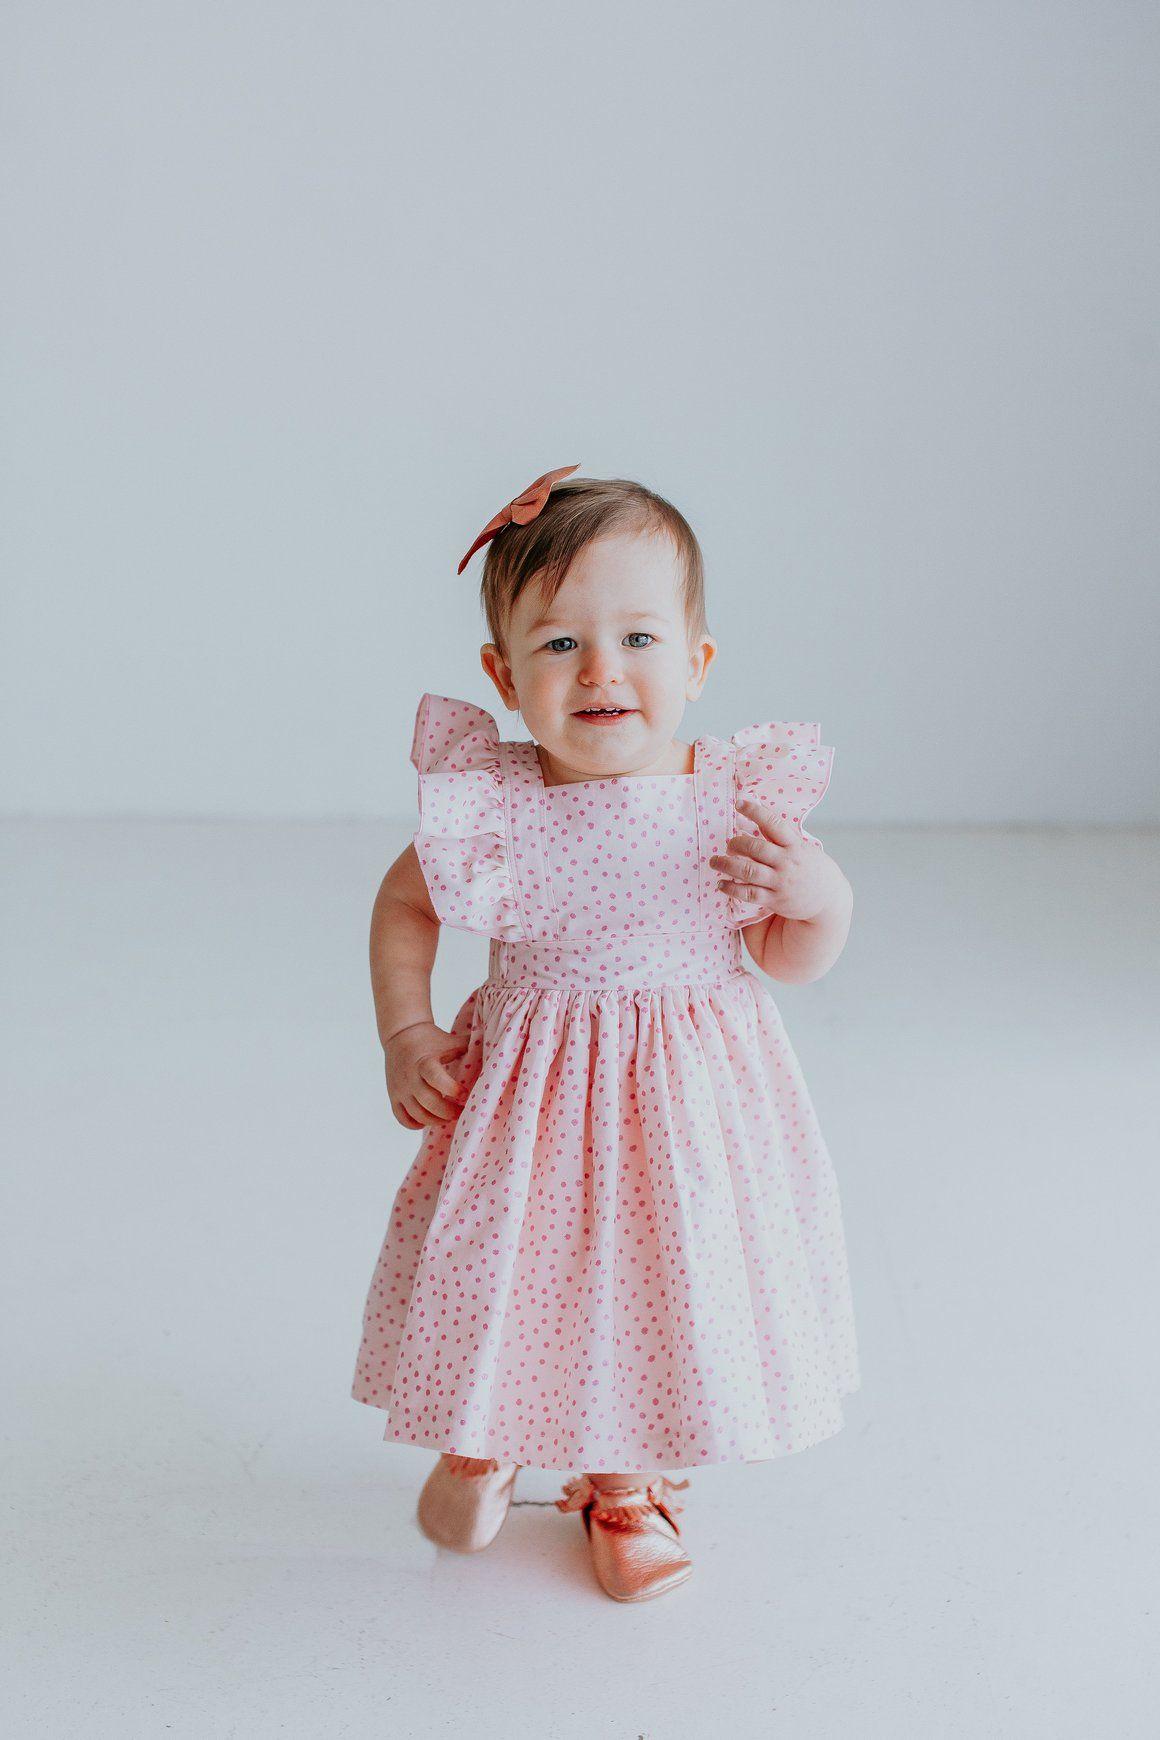 Eloise Pinafore Dress | Polka dot party dresses, Polka dot party and ...